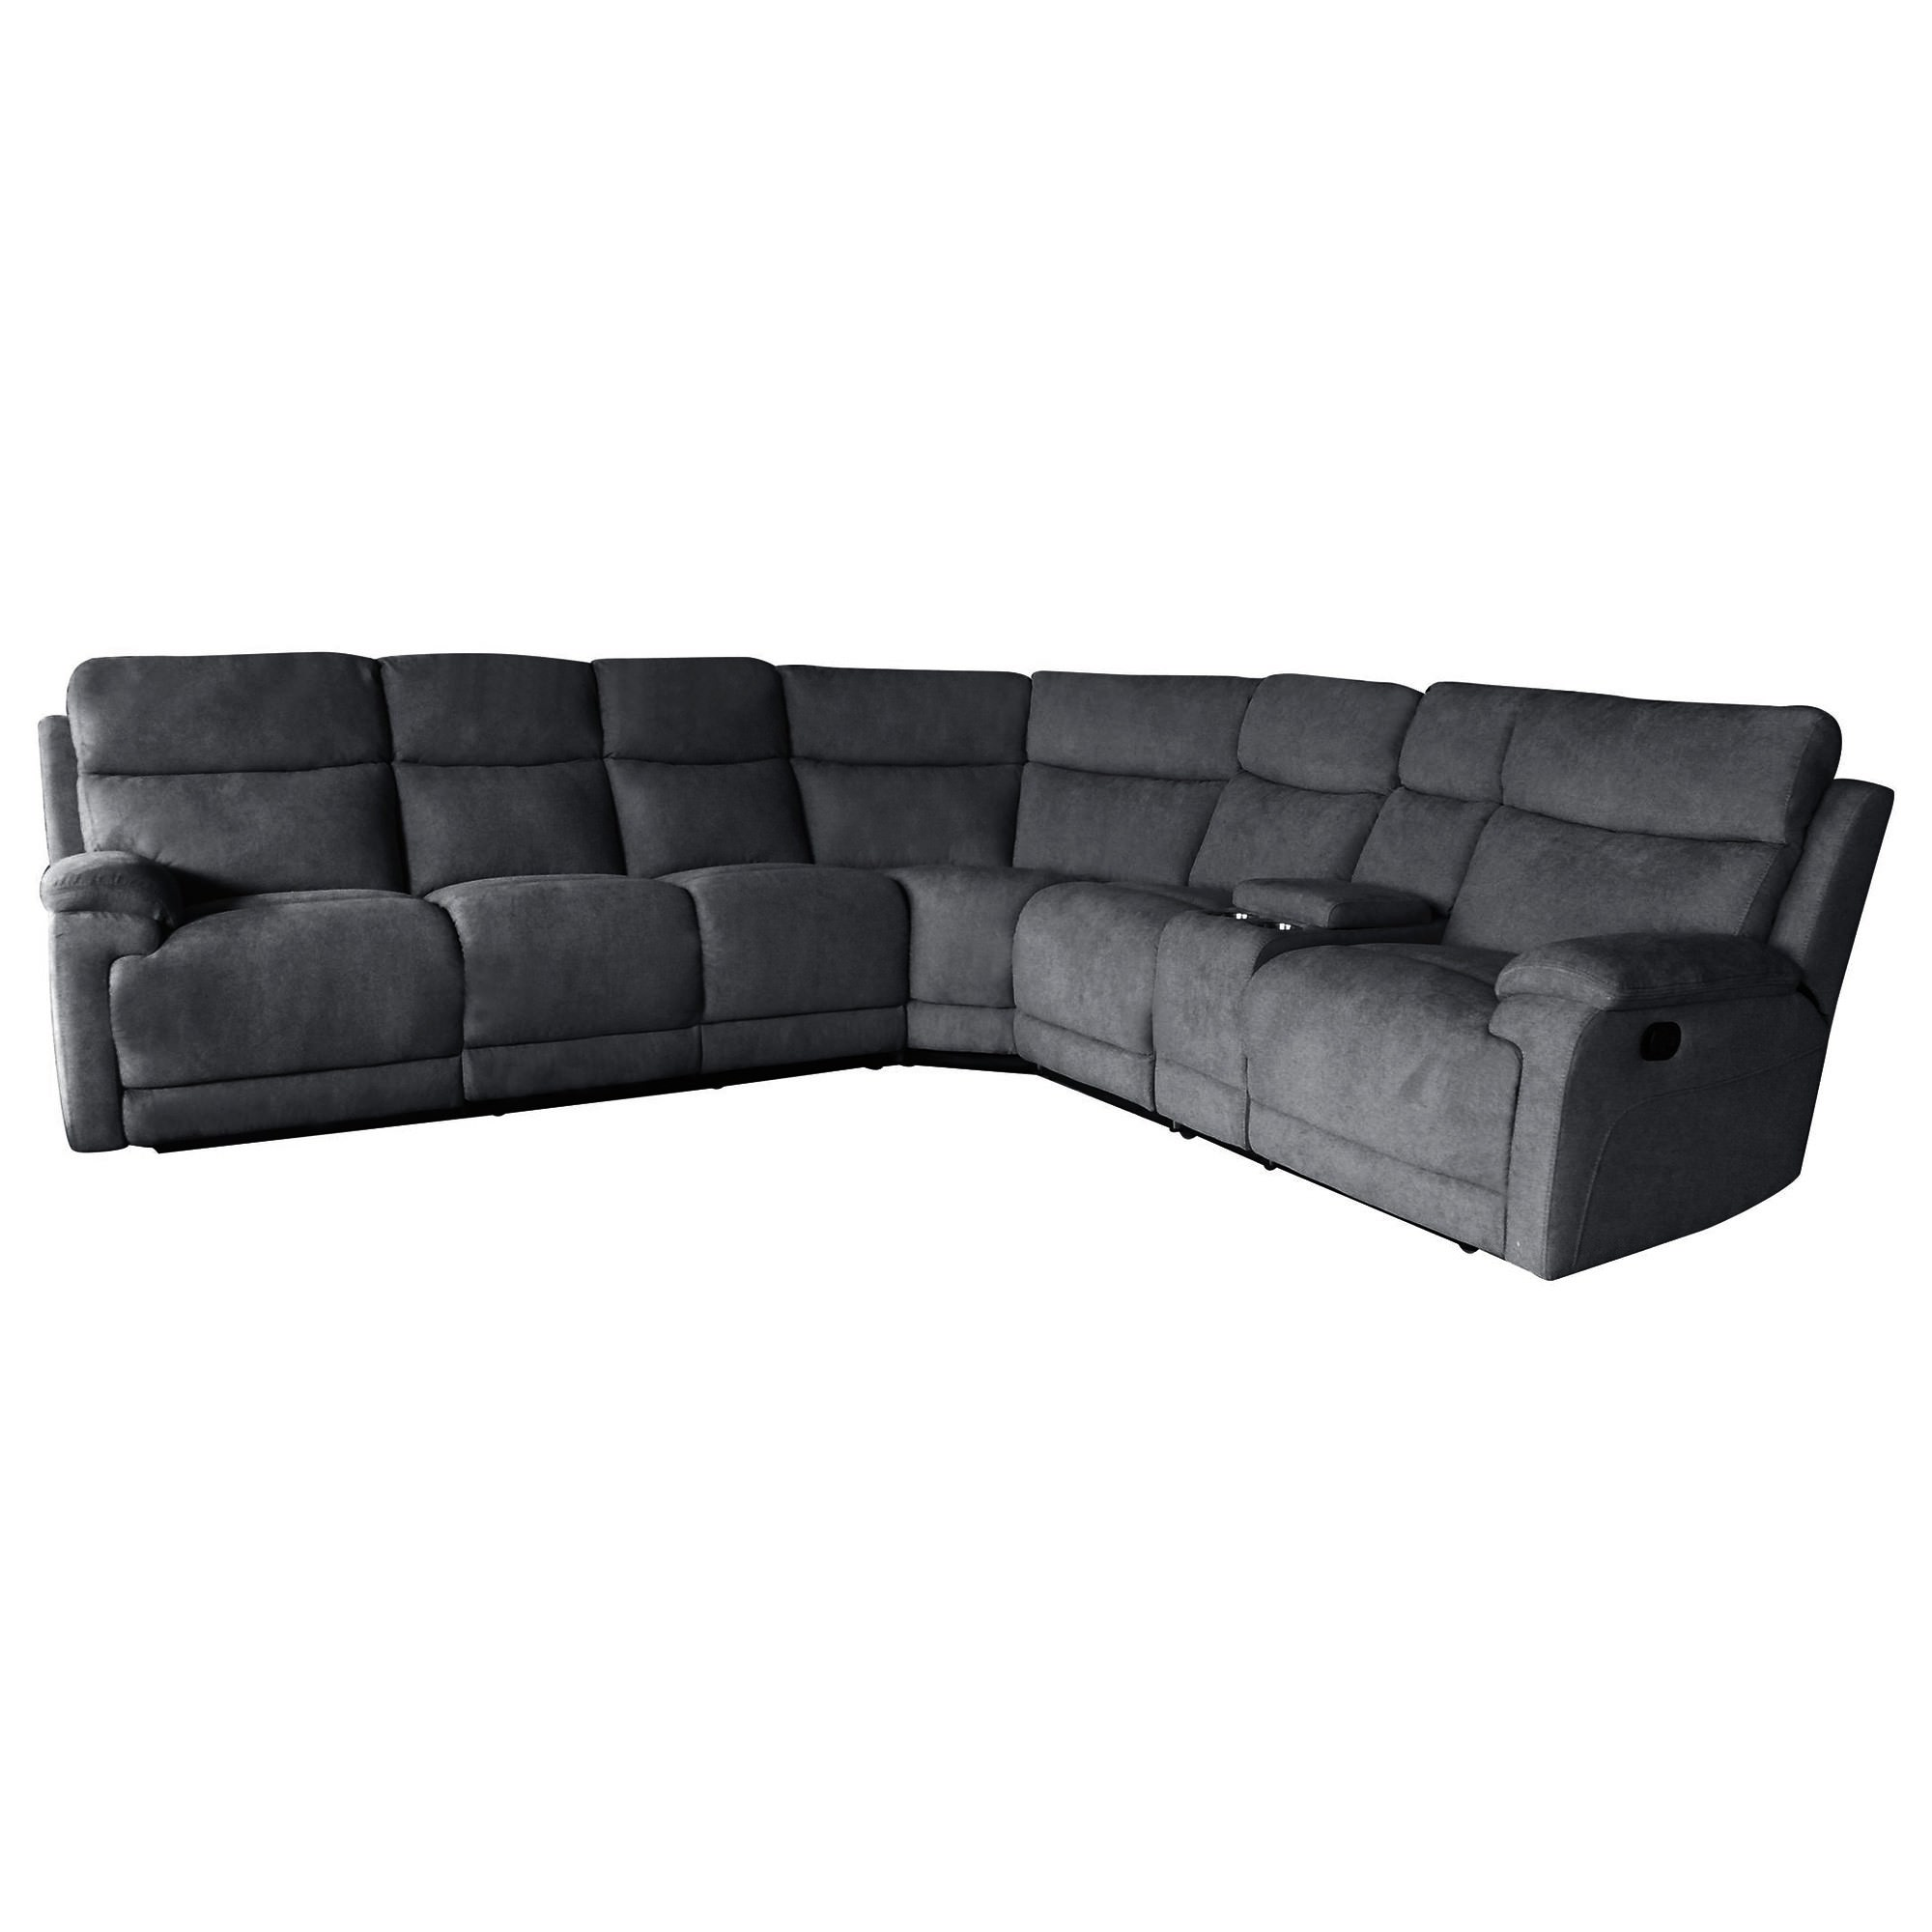 Columbia 5 Seater Rhino Fabric Corner Sofa with End Recliners, Charcoal